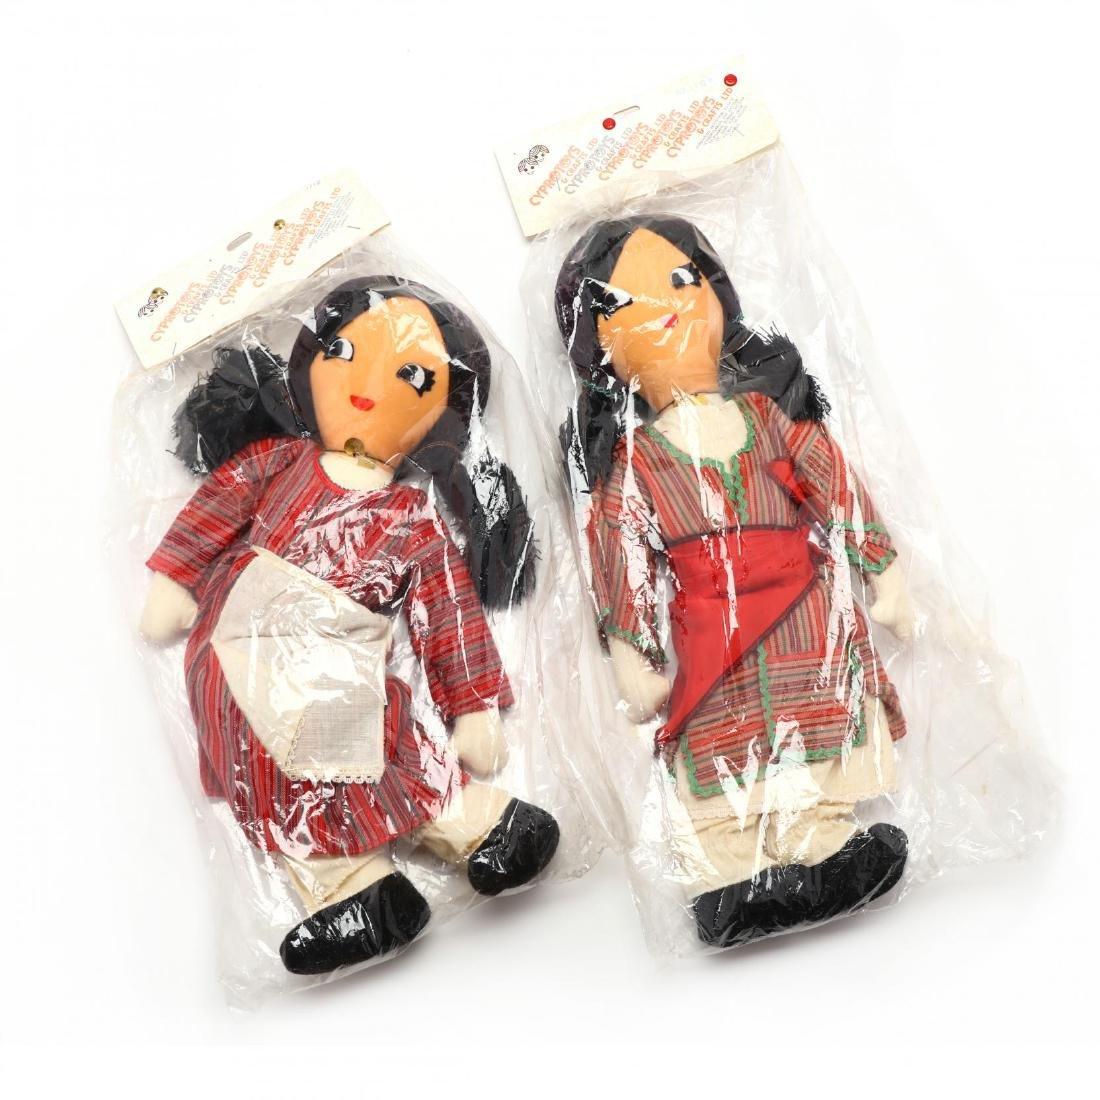 Pair of Handmade Dolls, Cyprus Crafts LTD.